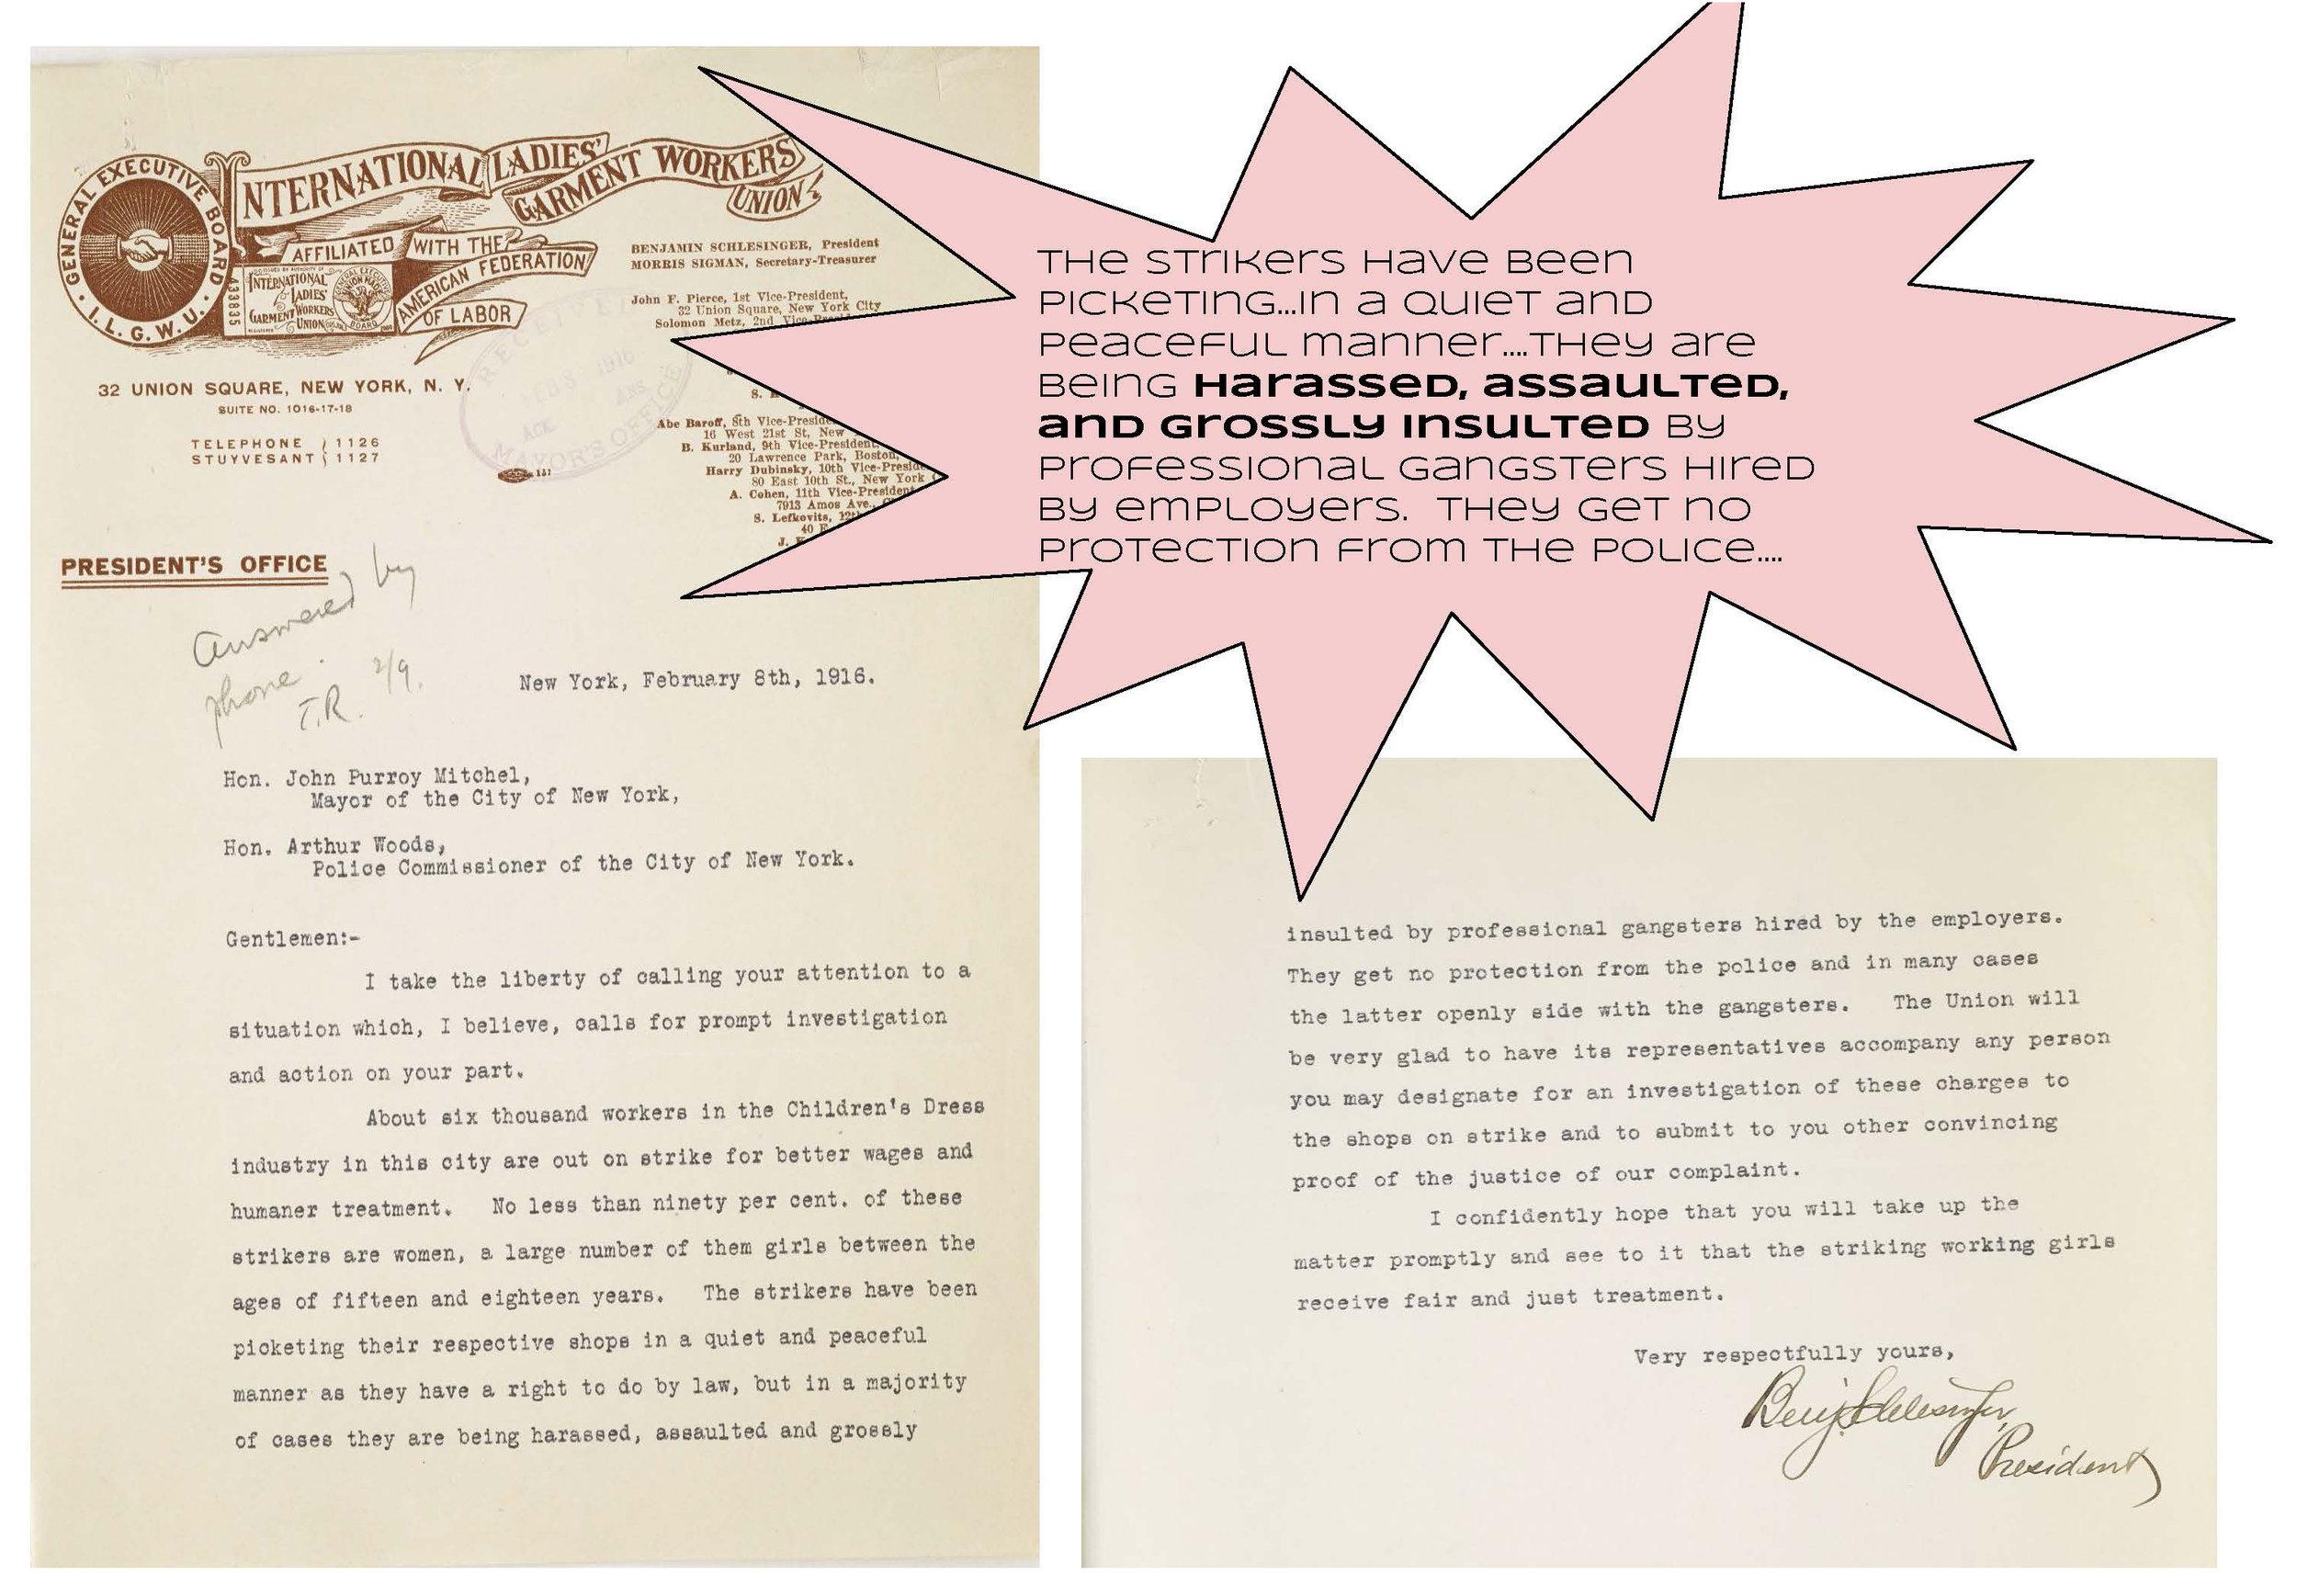 International Ladies' Garment Workers Union, 1916, Mayor John P. Mitchel Subject Files